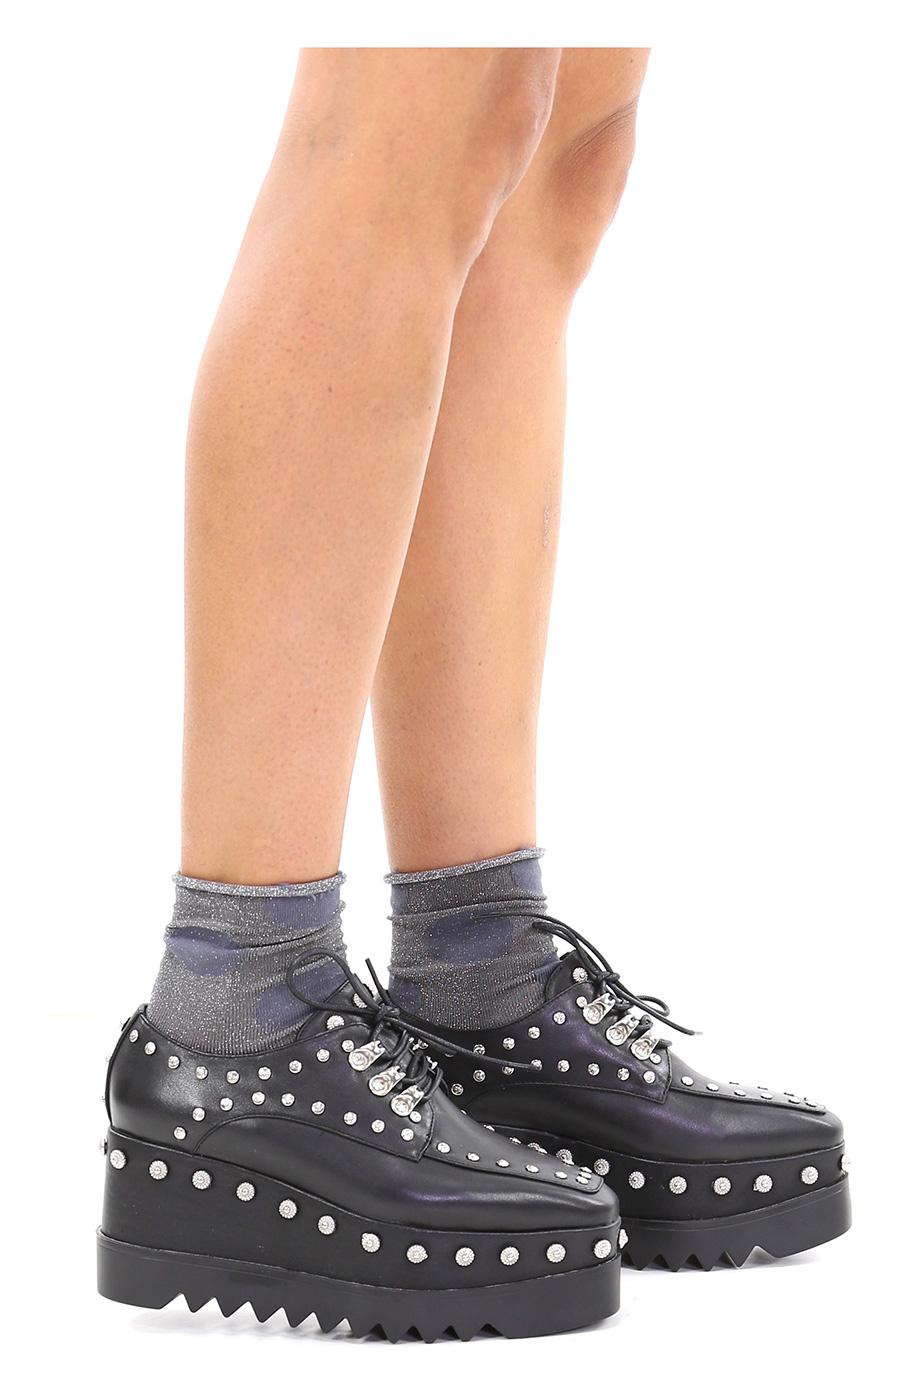 Scarpa bassa  Nero Nero  Norah Mode billige Schuhe 2fb982